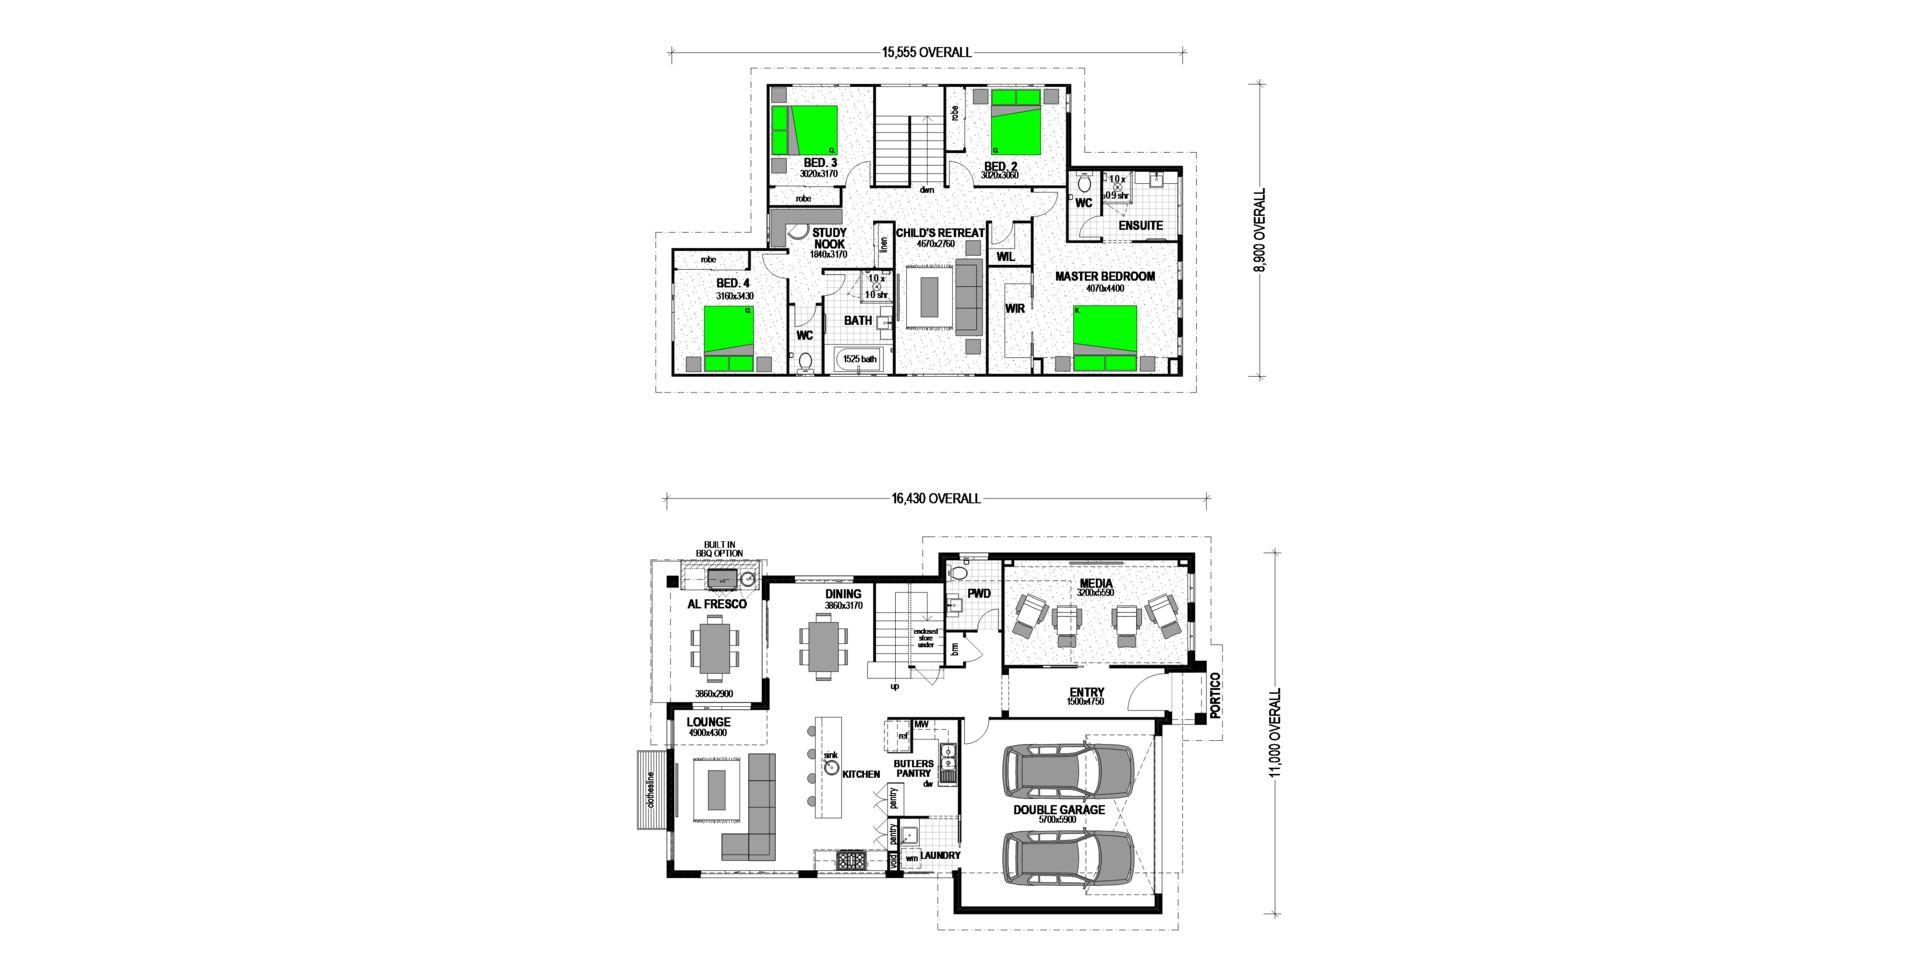 Lot 123 Mertz Place, Meadows SA 5201, Image 1